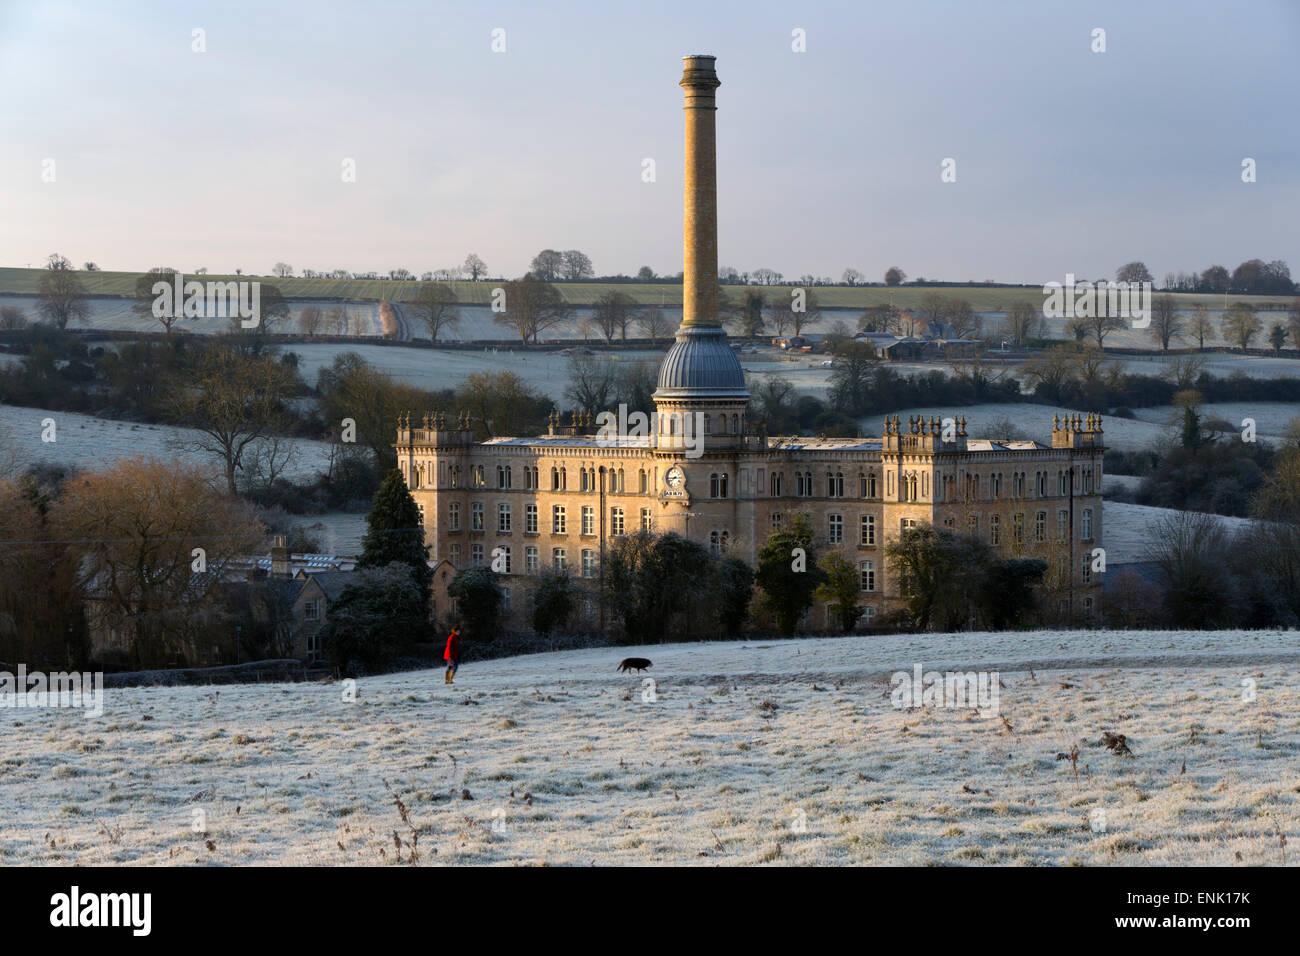 Bliss Mühle Morgen frost, Chipping Norton, Cotswolds, Oxfordshire, England, Vereinigtes Königreich, Europa Stockbild